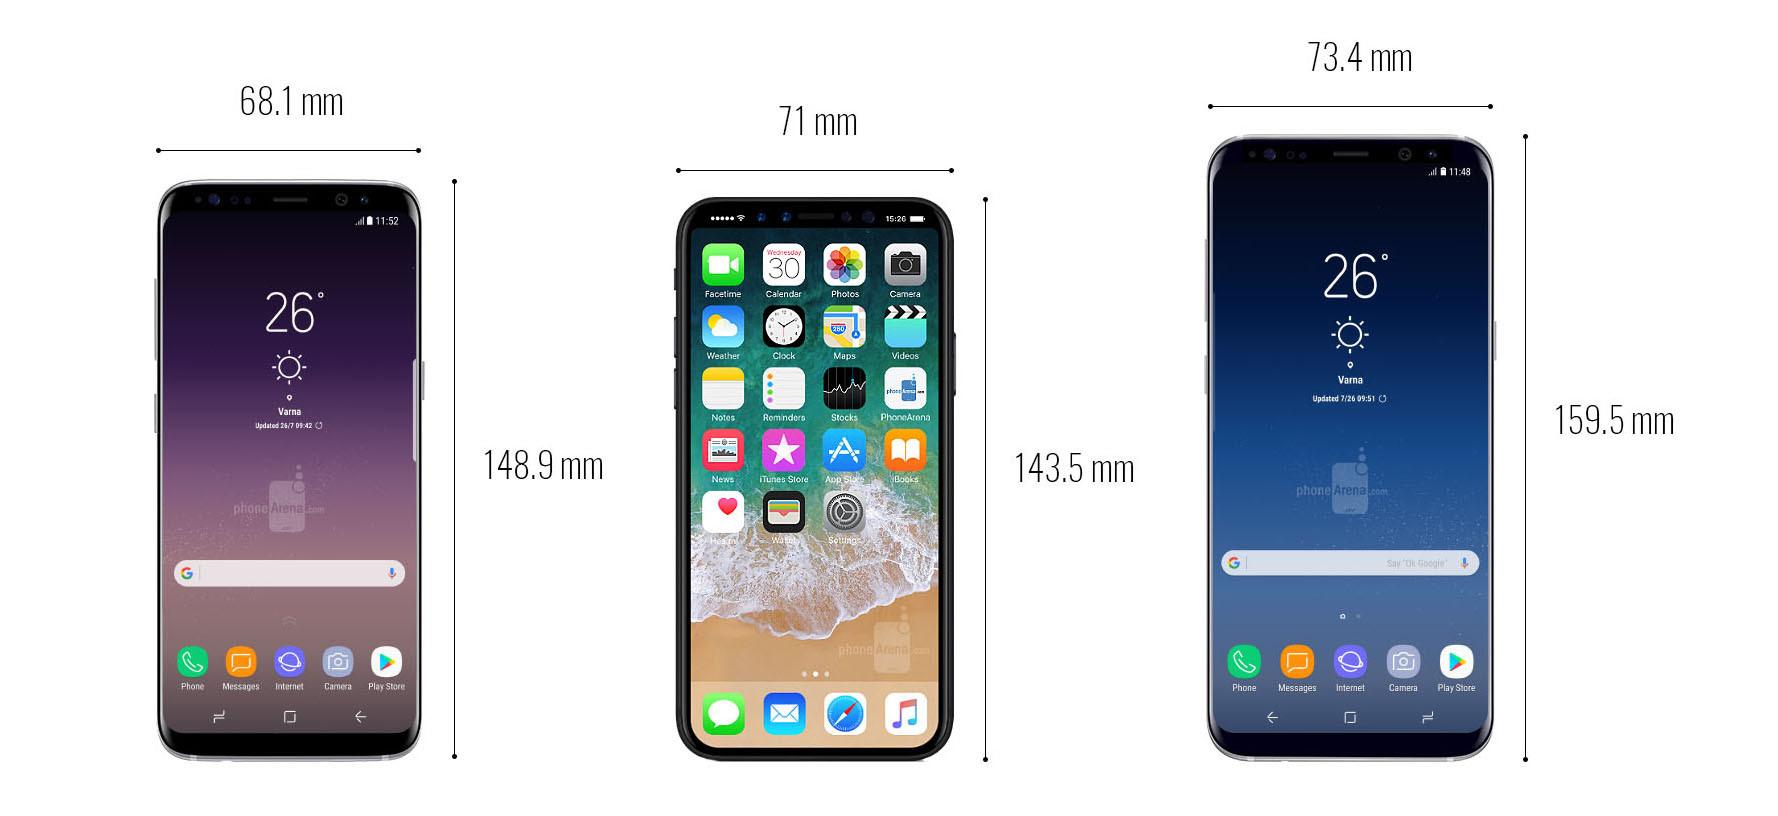 1501772697_samsung-galaxy-s8-vs-apple-iphone-8-vs-samsung-galaxy-s8-plus.jpg